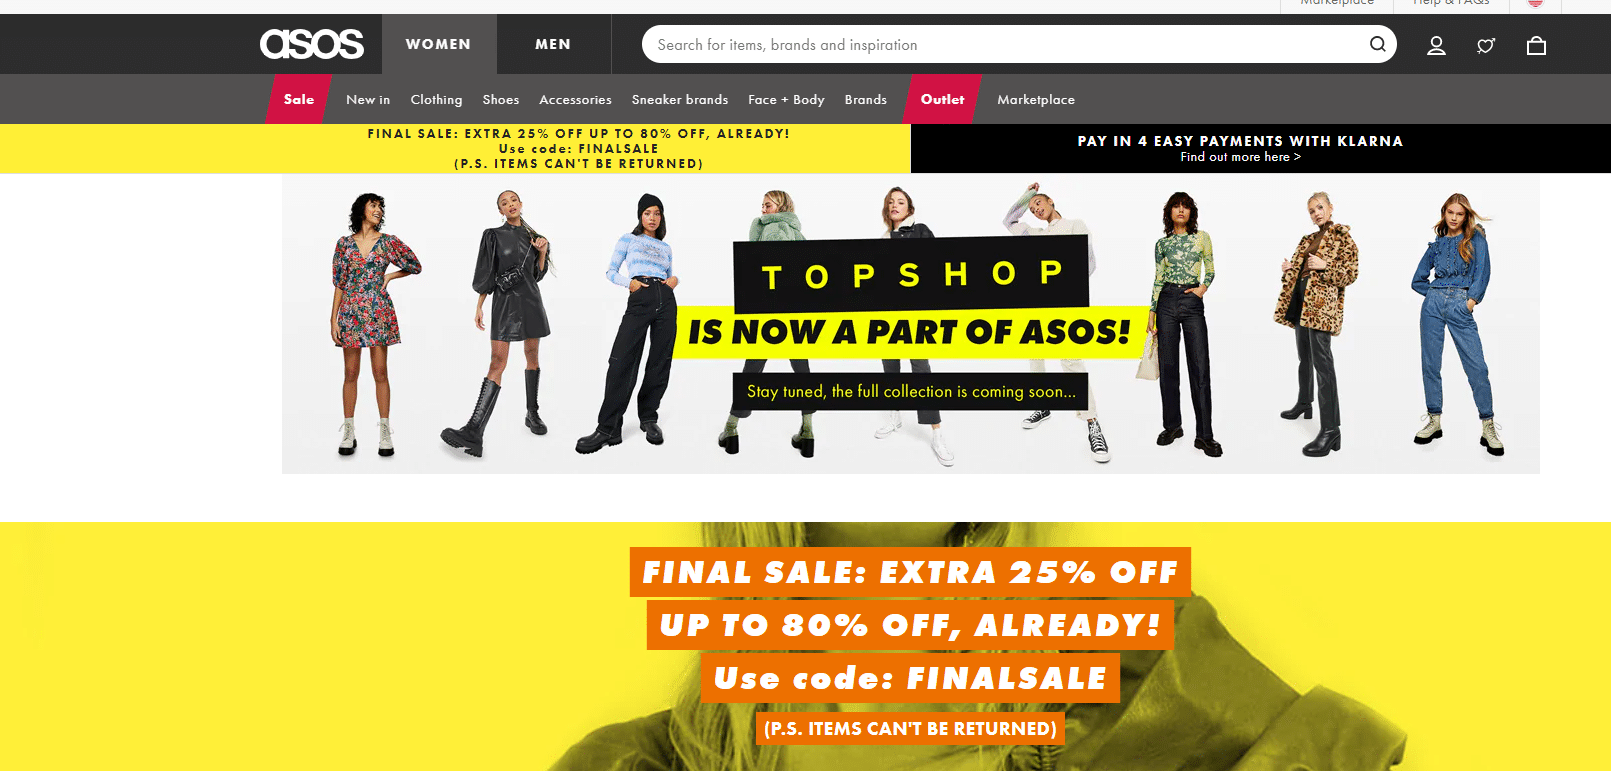 asos 25% off promo code